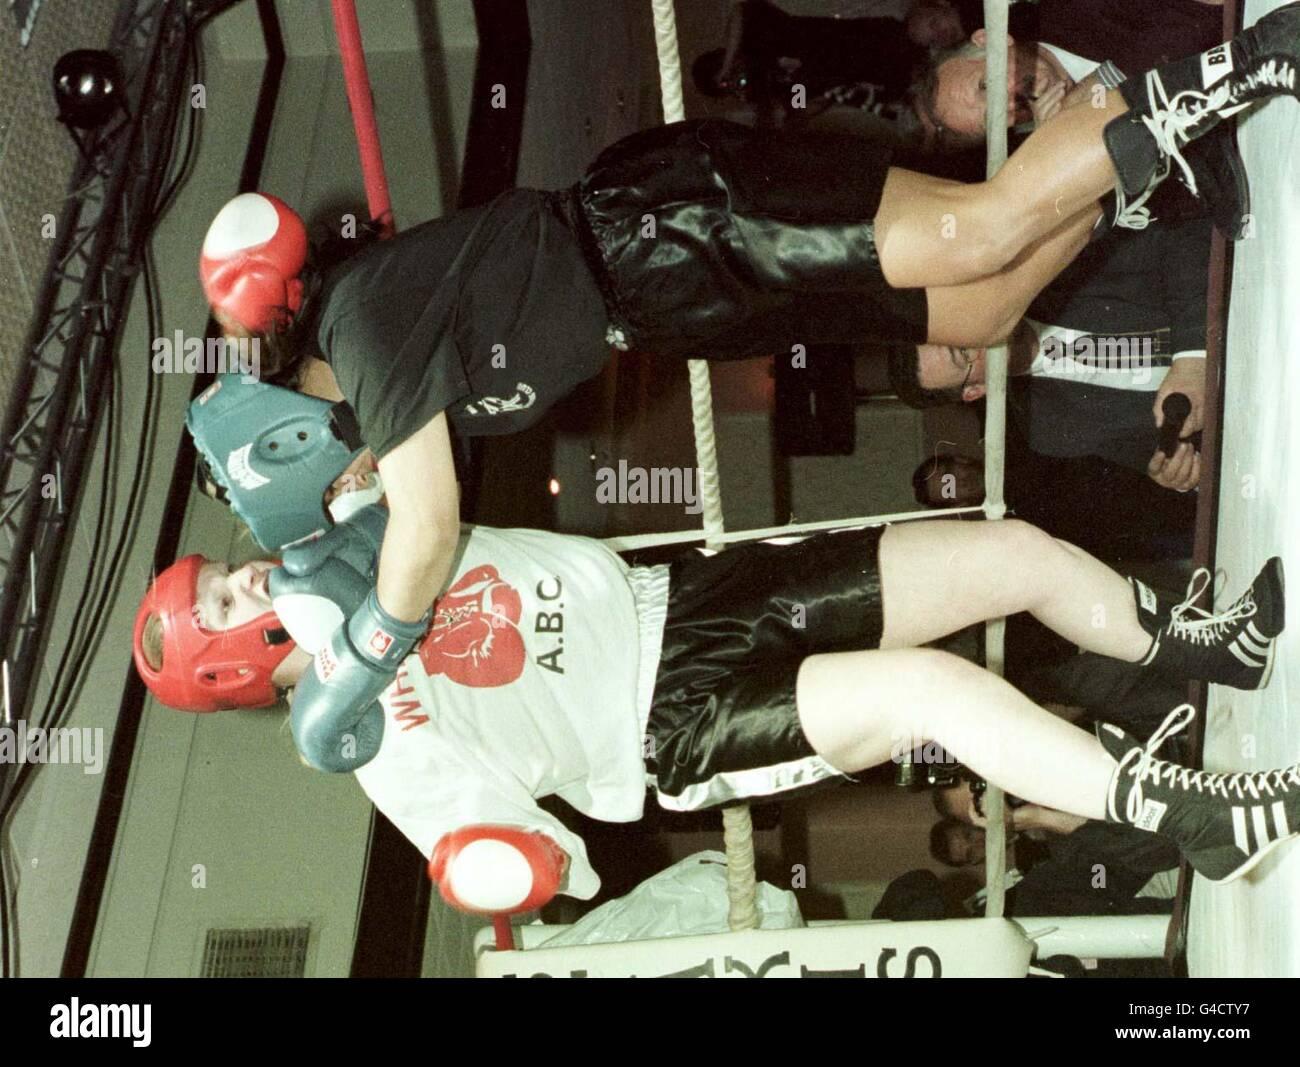 Acción de boxeo femenino Imagen De Stock